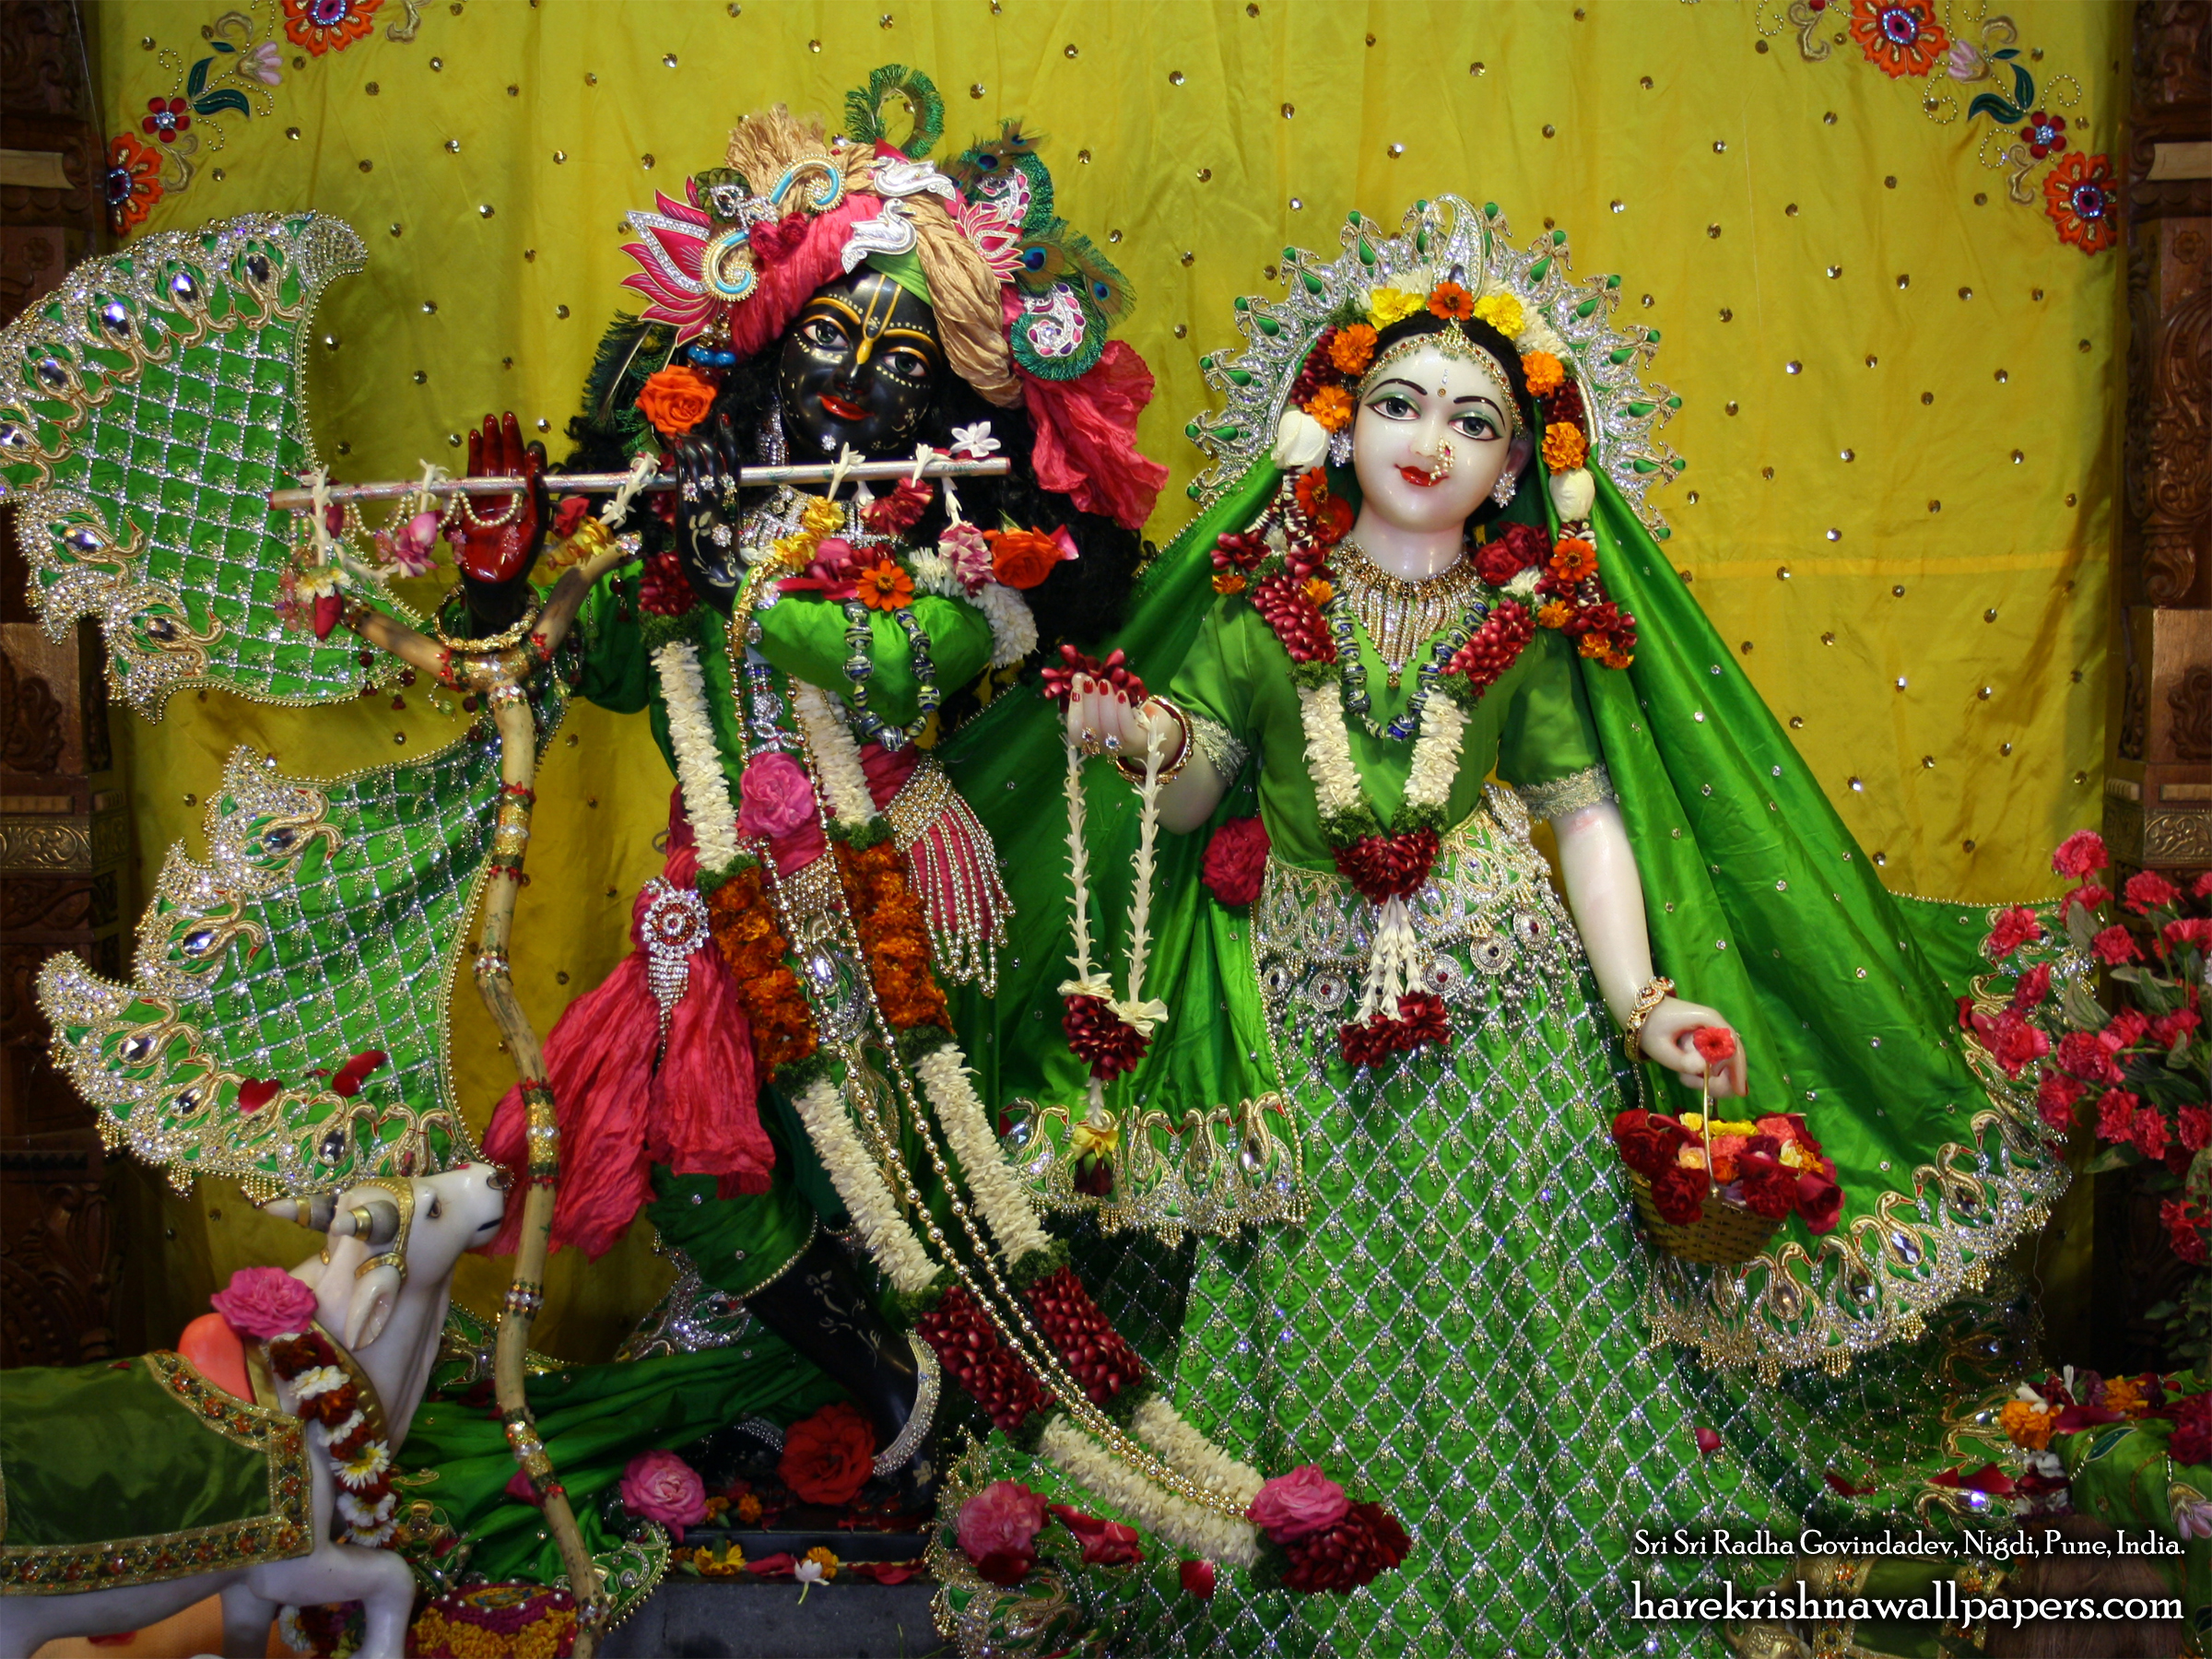 Sri Sri Radha Govind Wallpaper (040) Size 2400x1800 Download